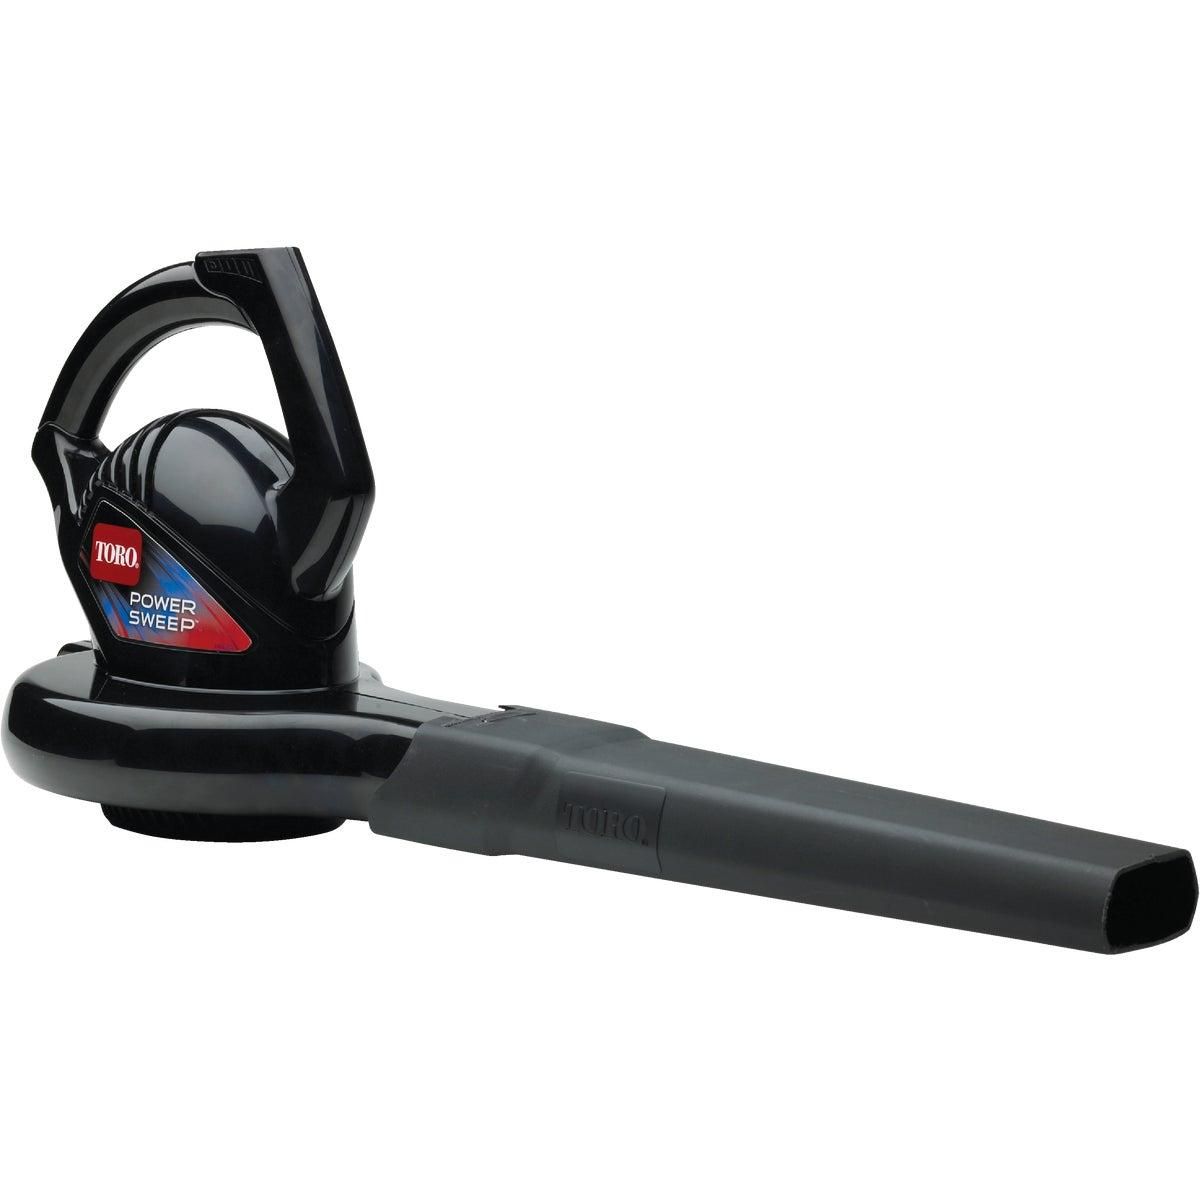 Toro Power Sweep Electric Blower, 51585